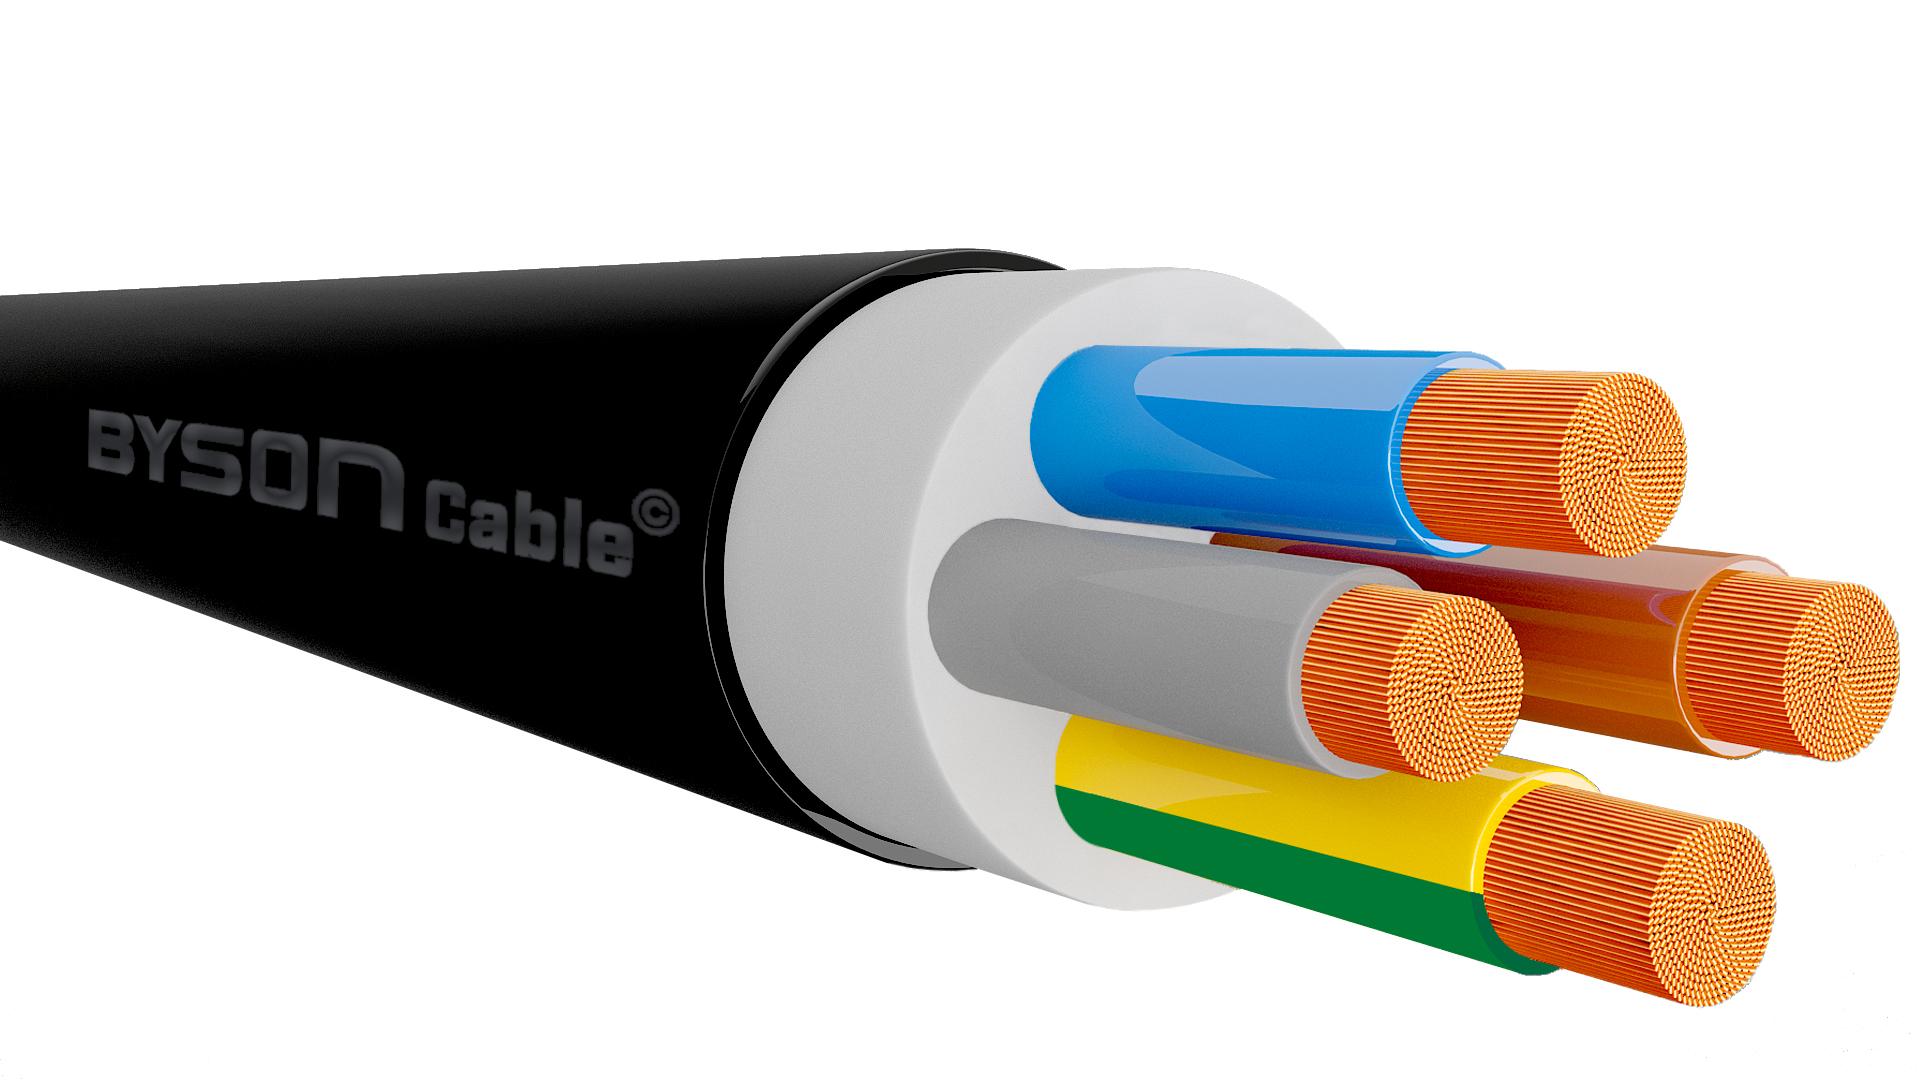 jenis kabel listrik nyy